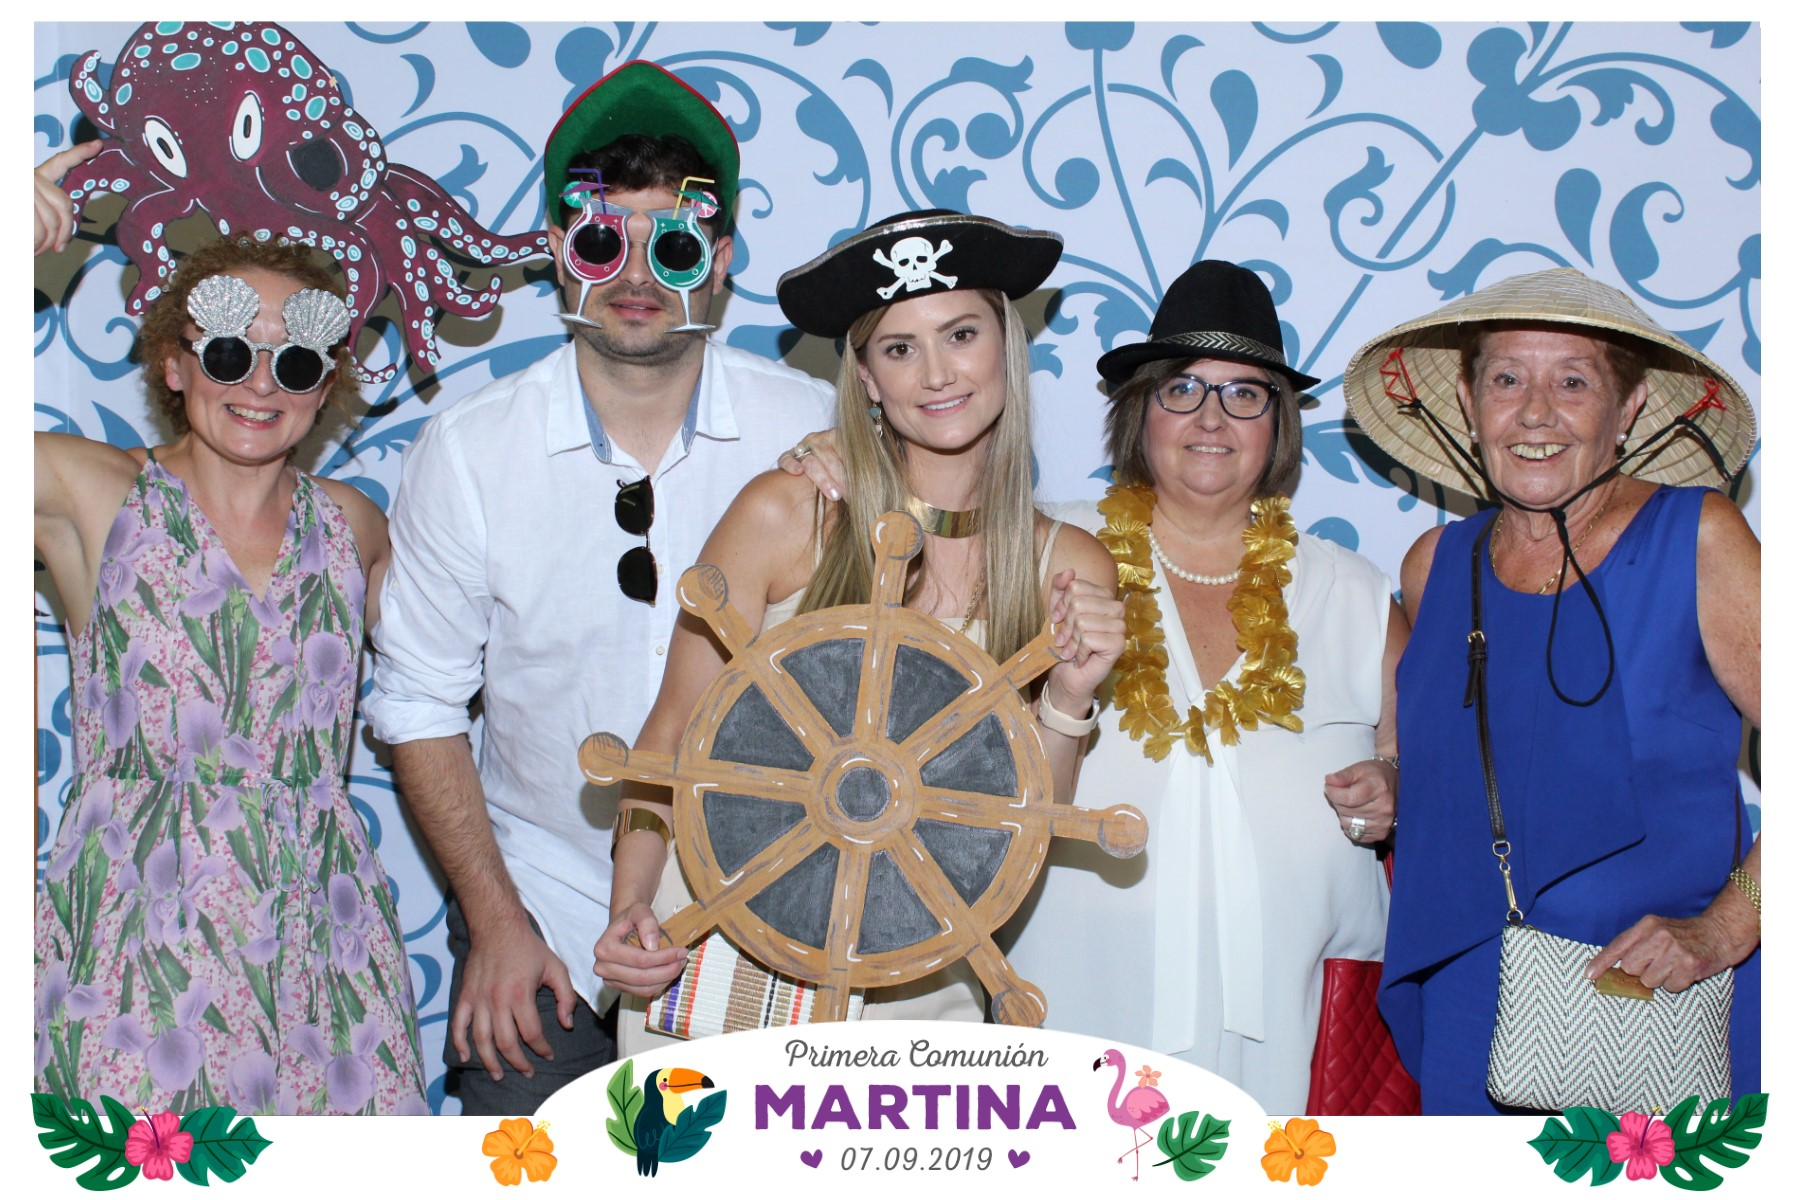 Comunion Martina 07092019 Mrfotomaton (34)